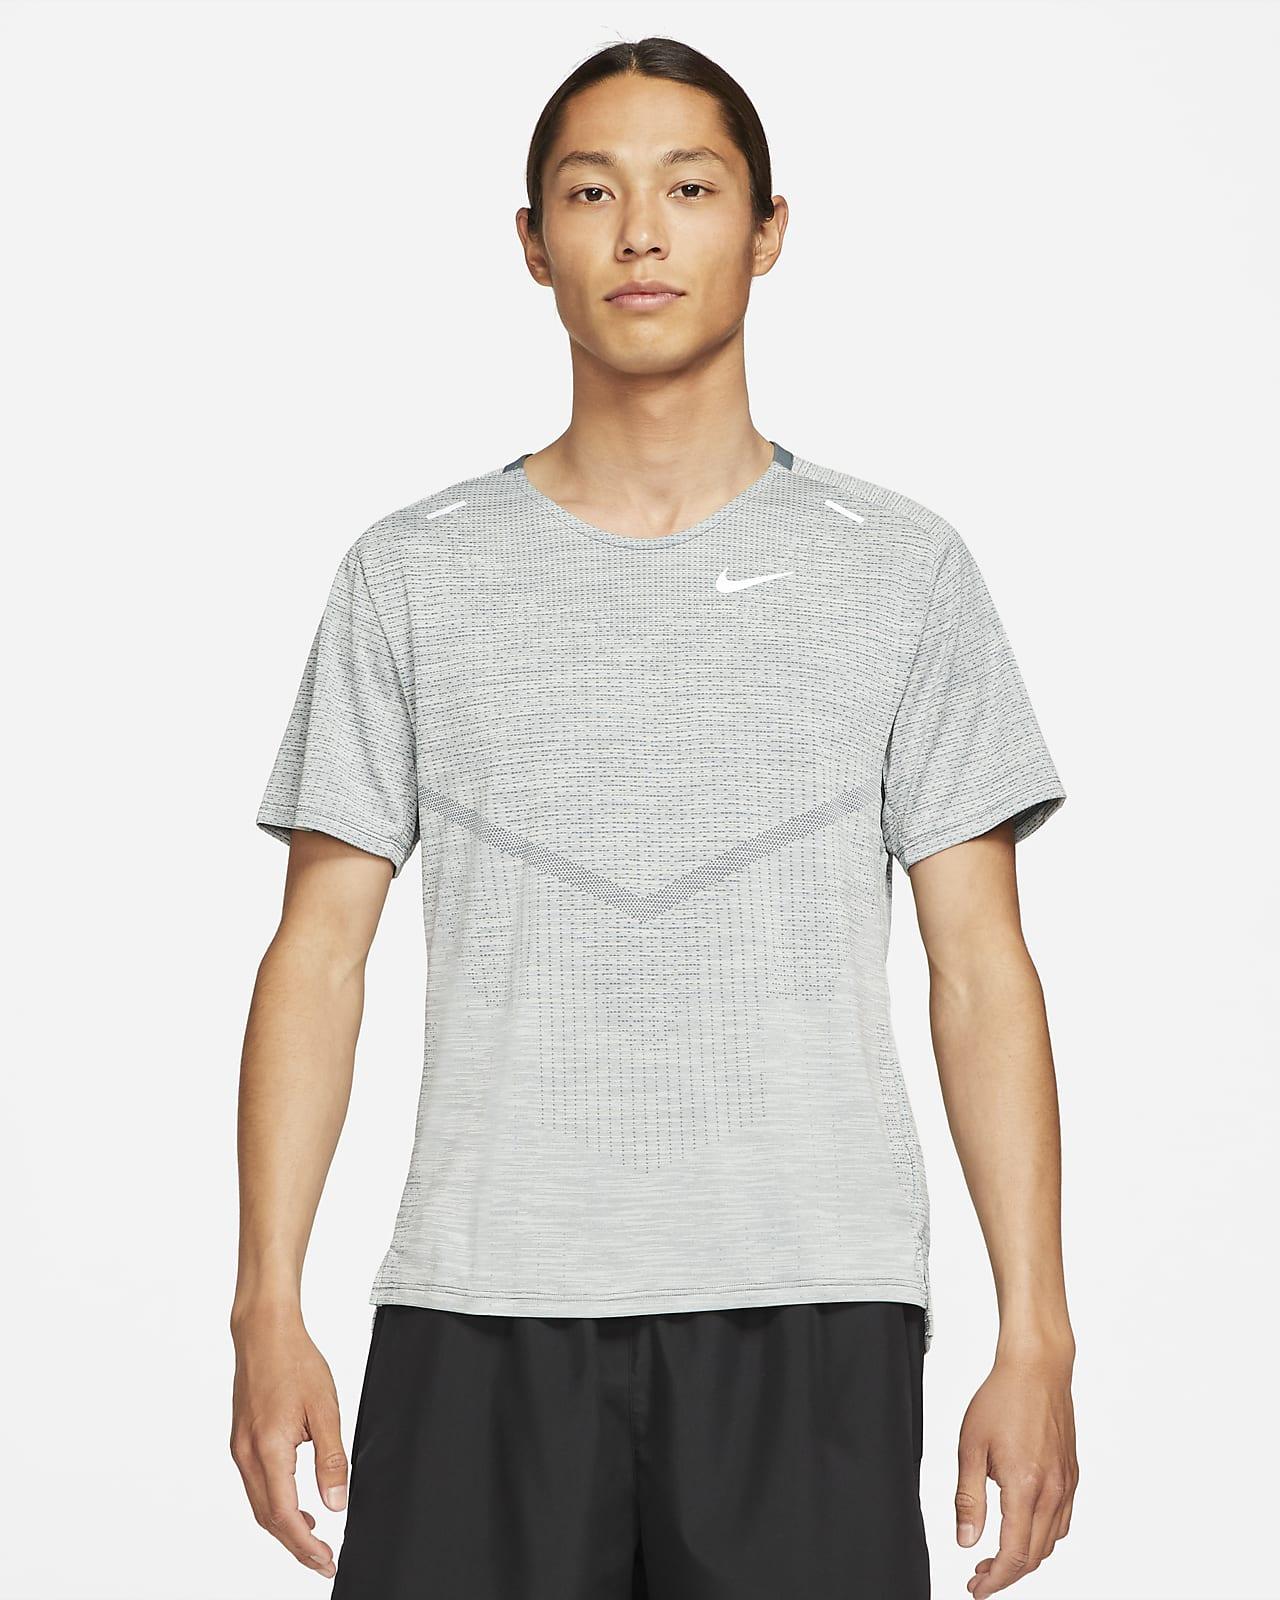 Nike Dri-FIT ADV Techknit Ultra Men's Short-Sleeve Running Top